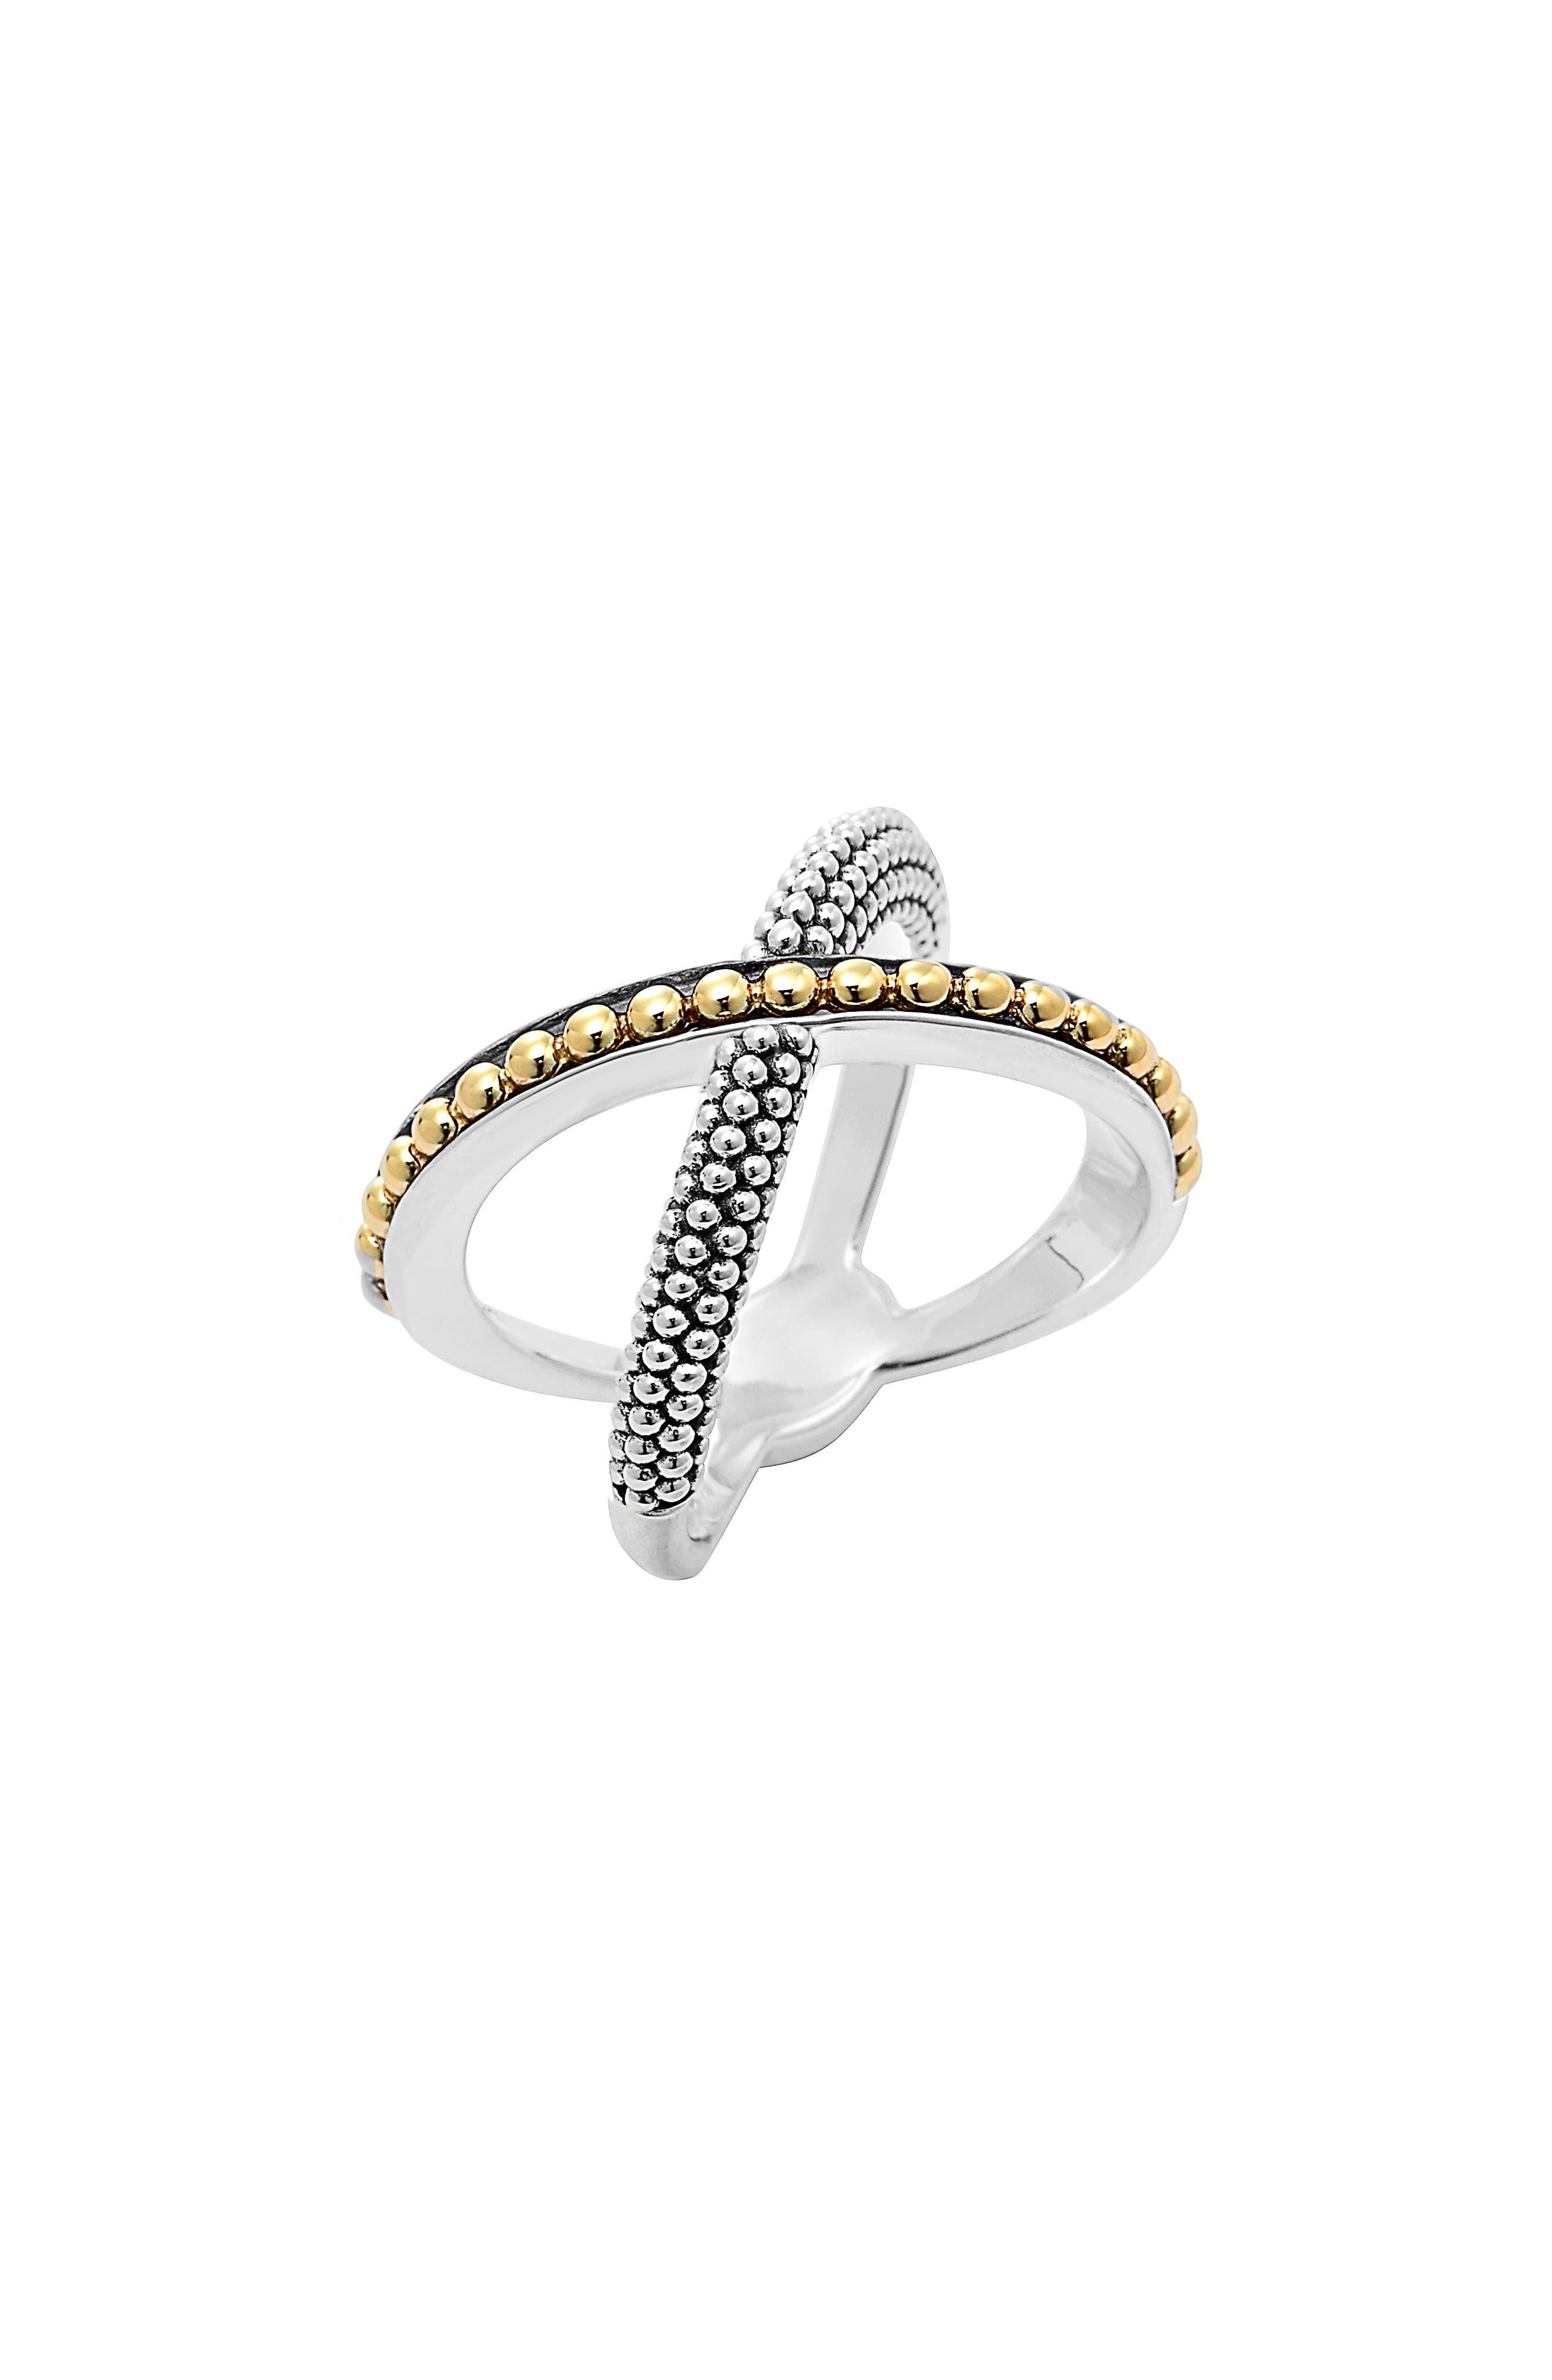 'Enso' Caviar Crossover Ring,                         Main,                         color, SILVER/ GOLD